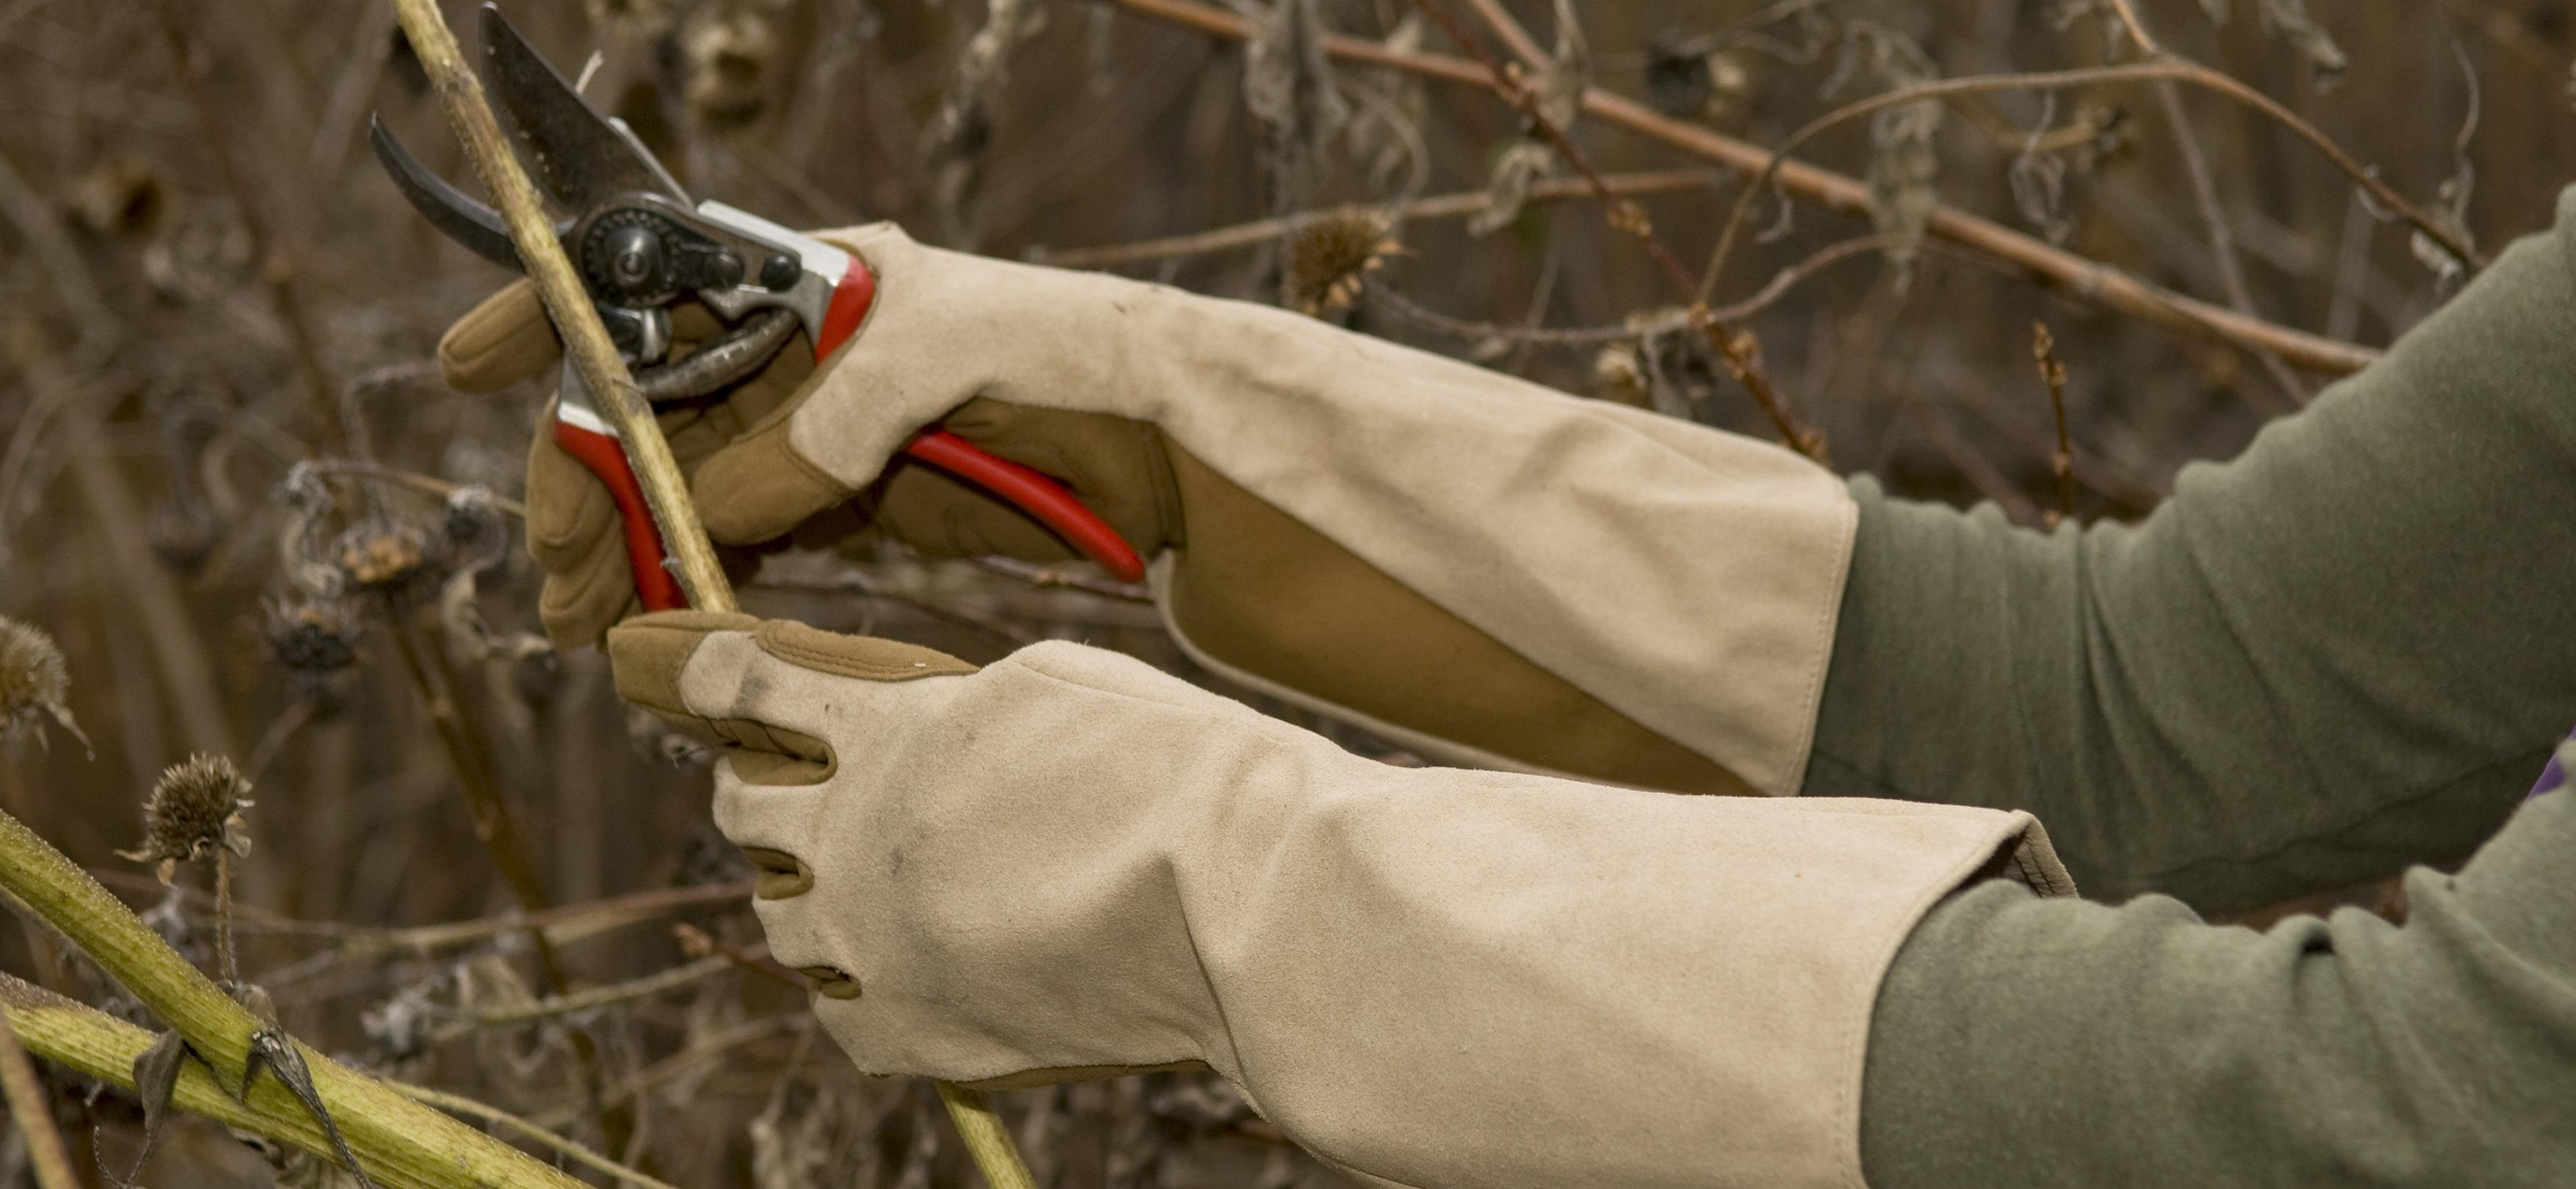 Pruning gloves